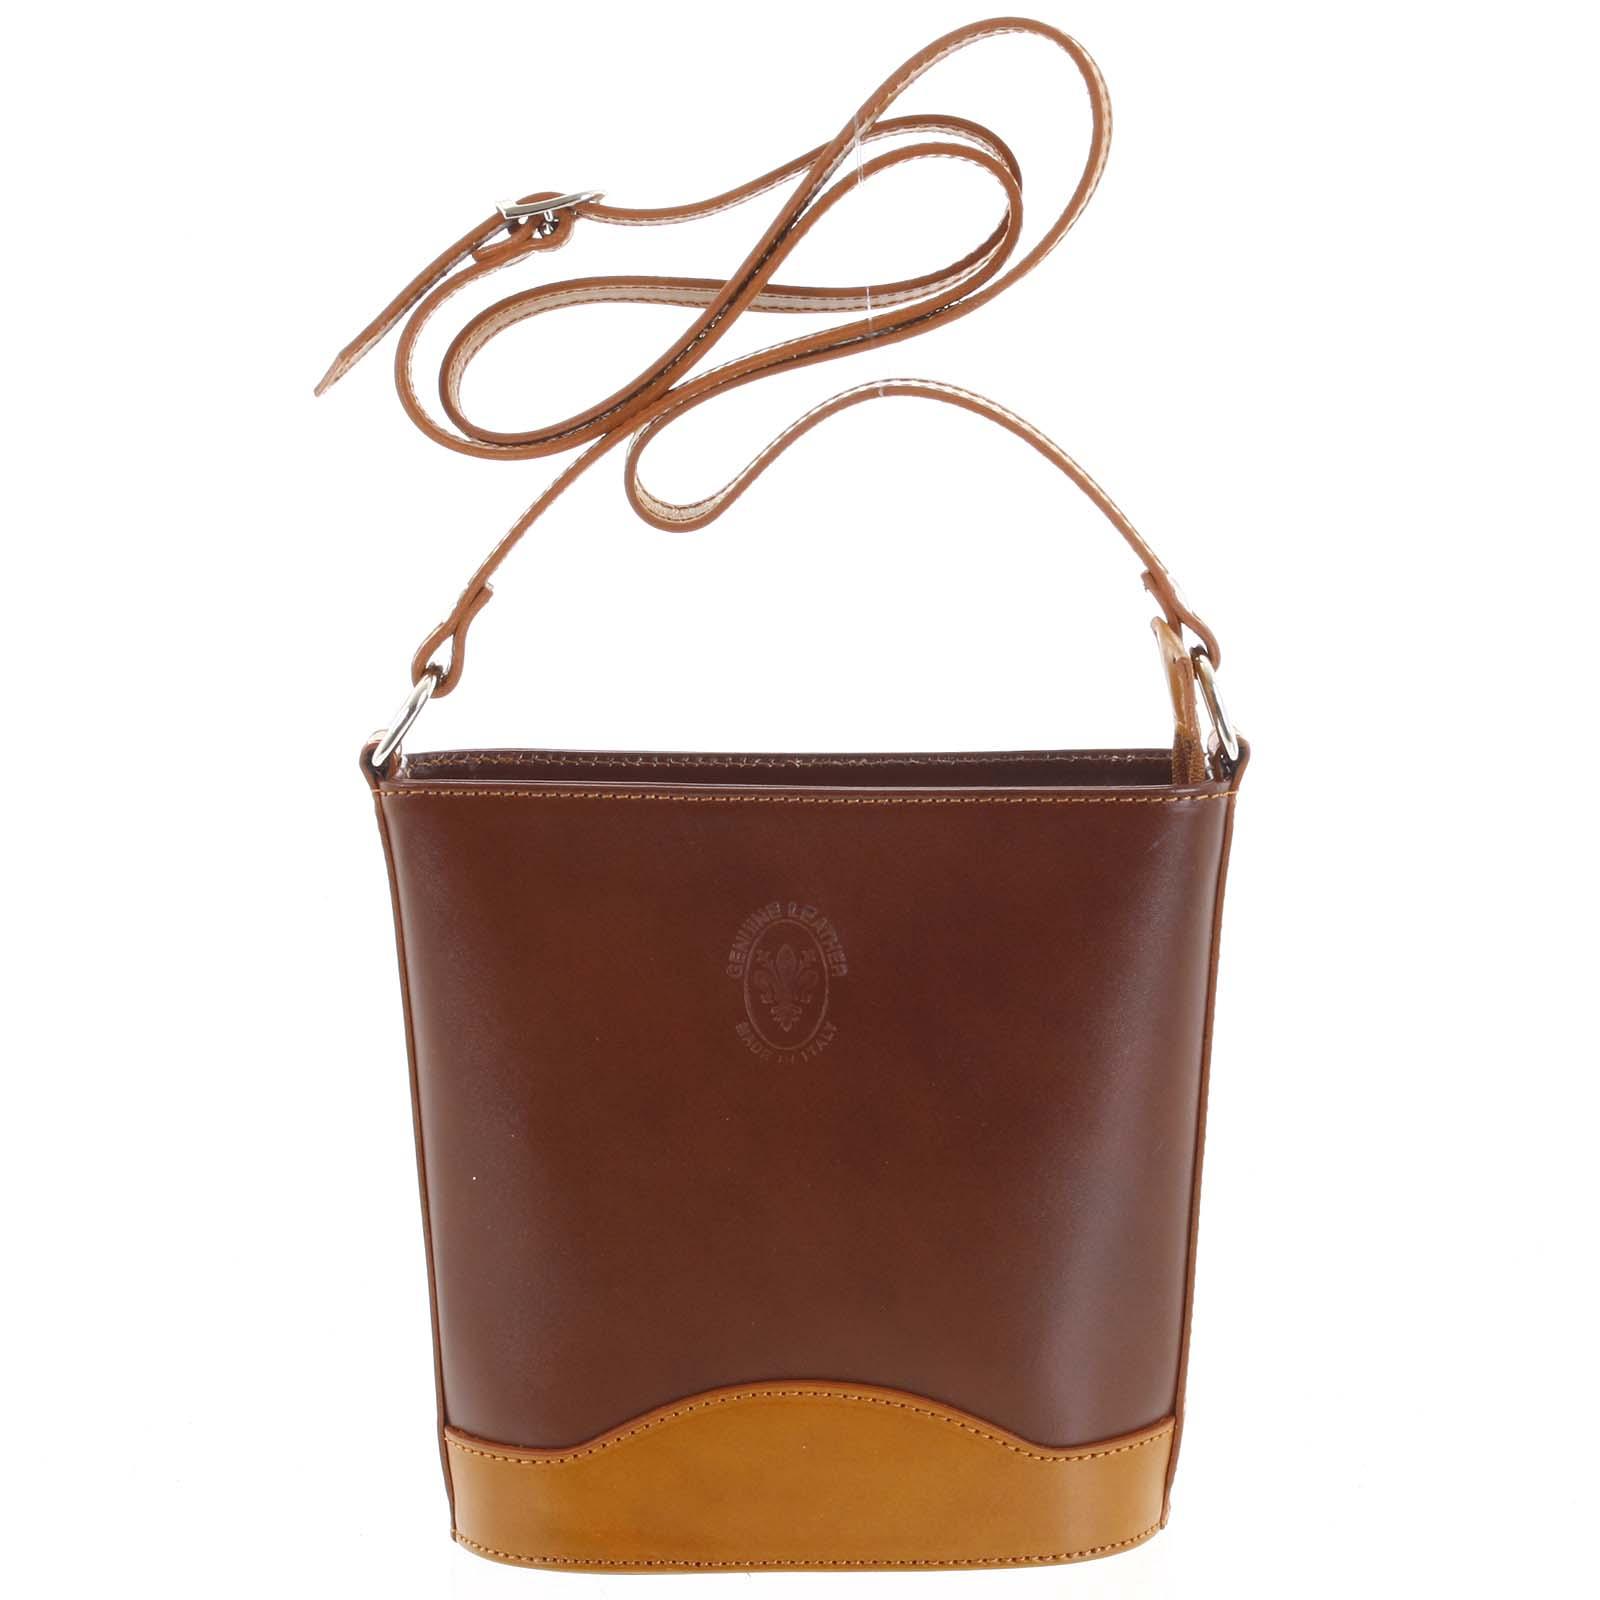 Hnedo koňaková kožená crossbody kabelka - ItalY Bryana hnedá